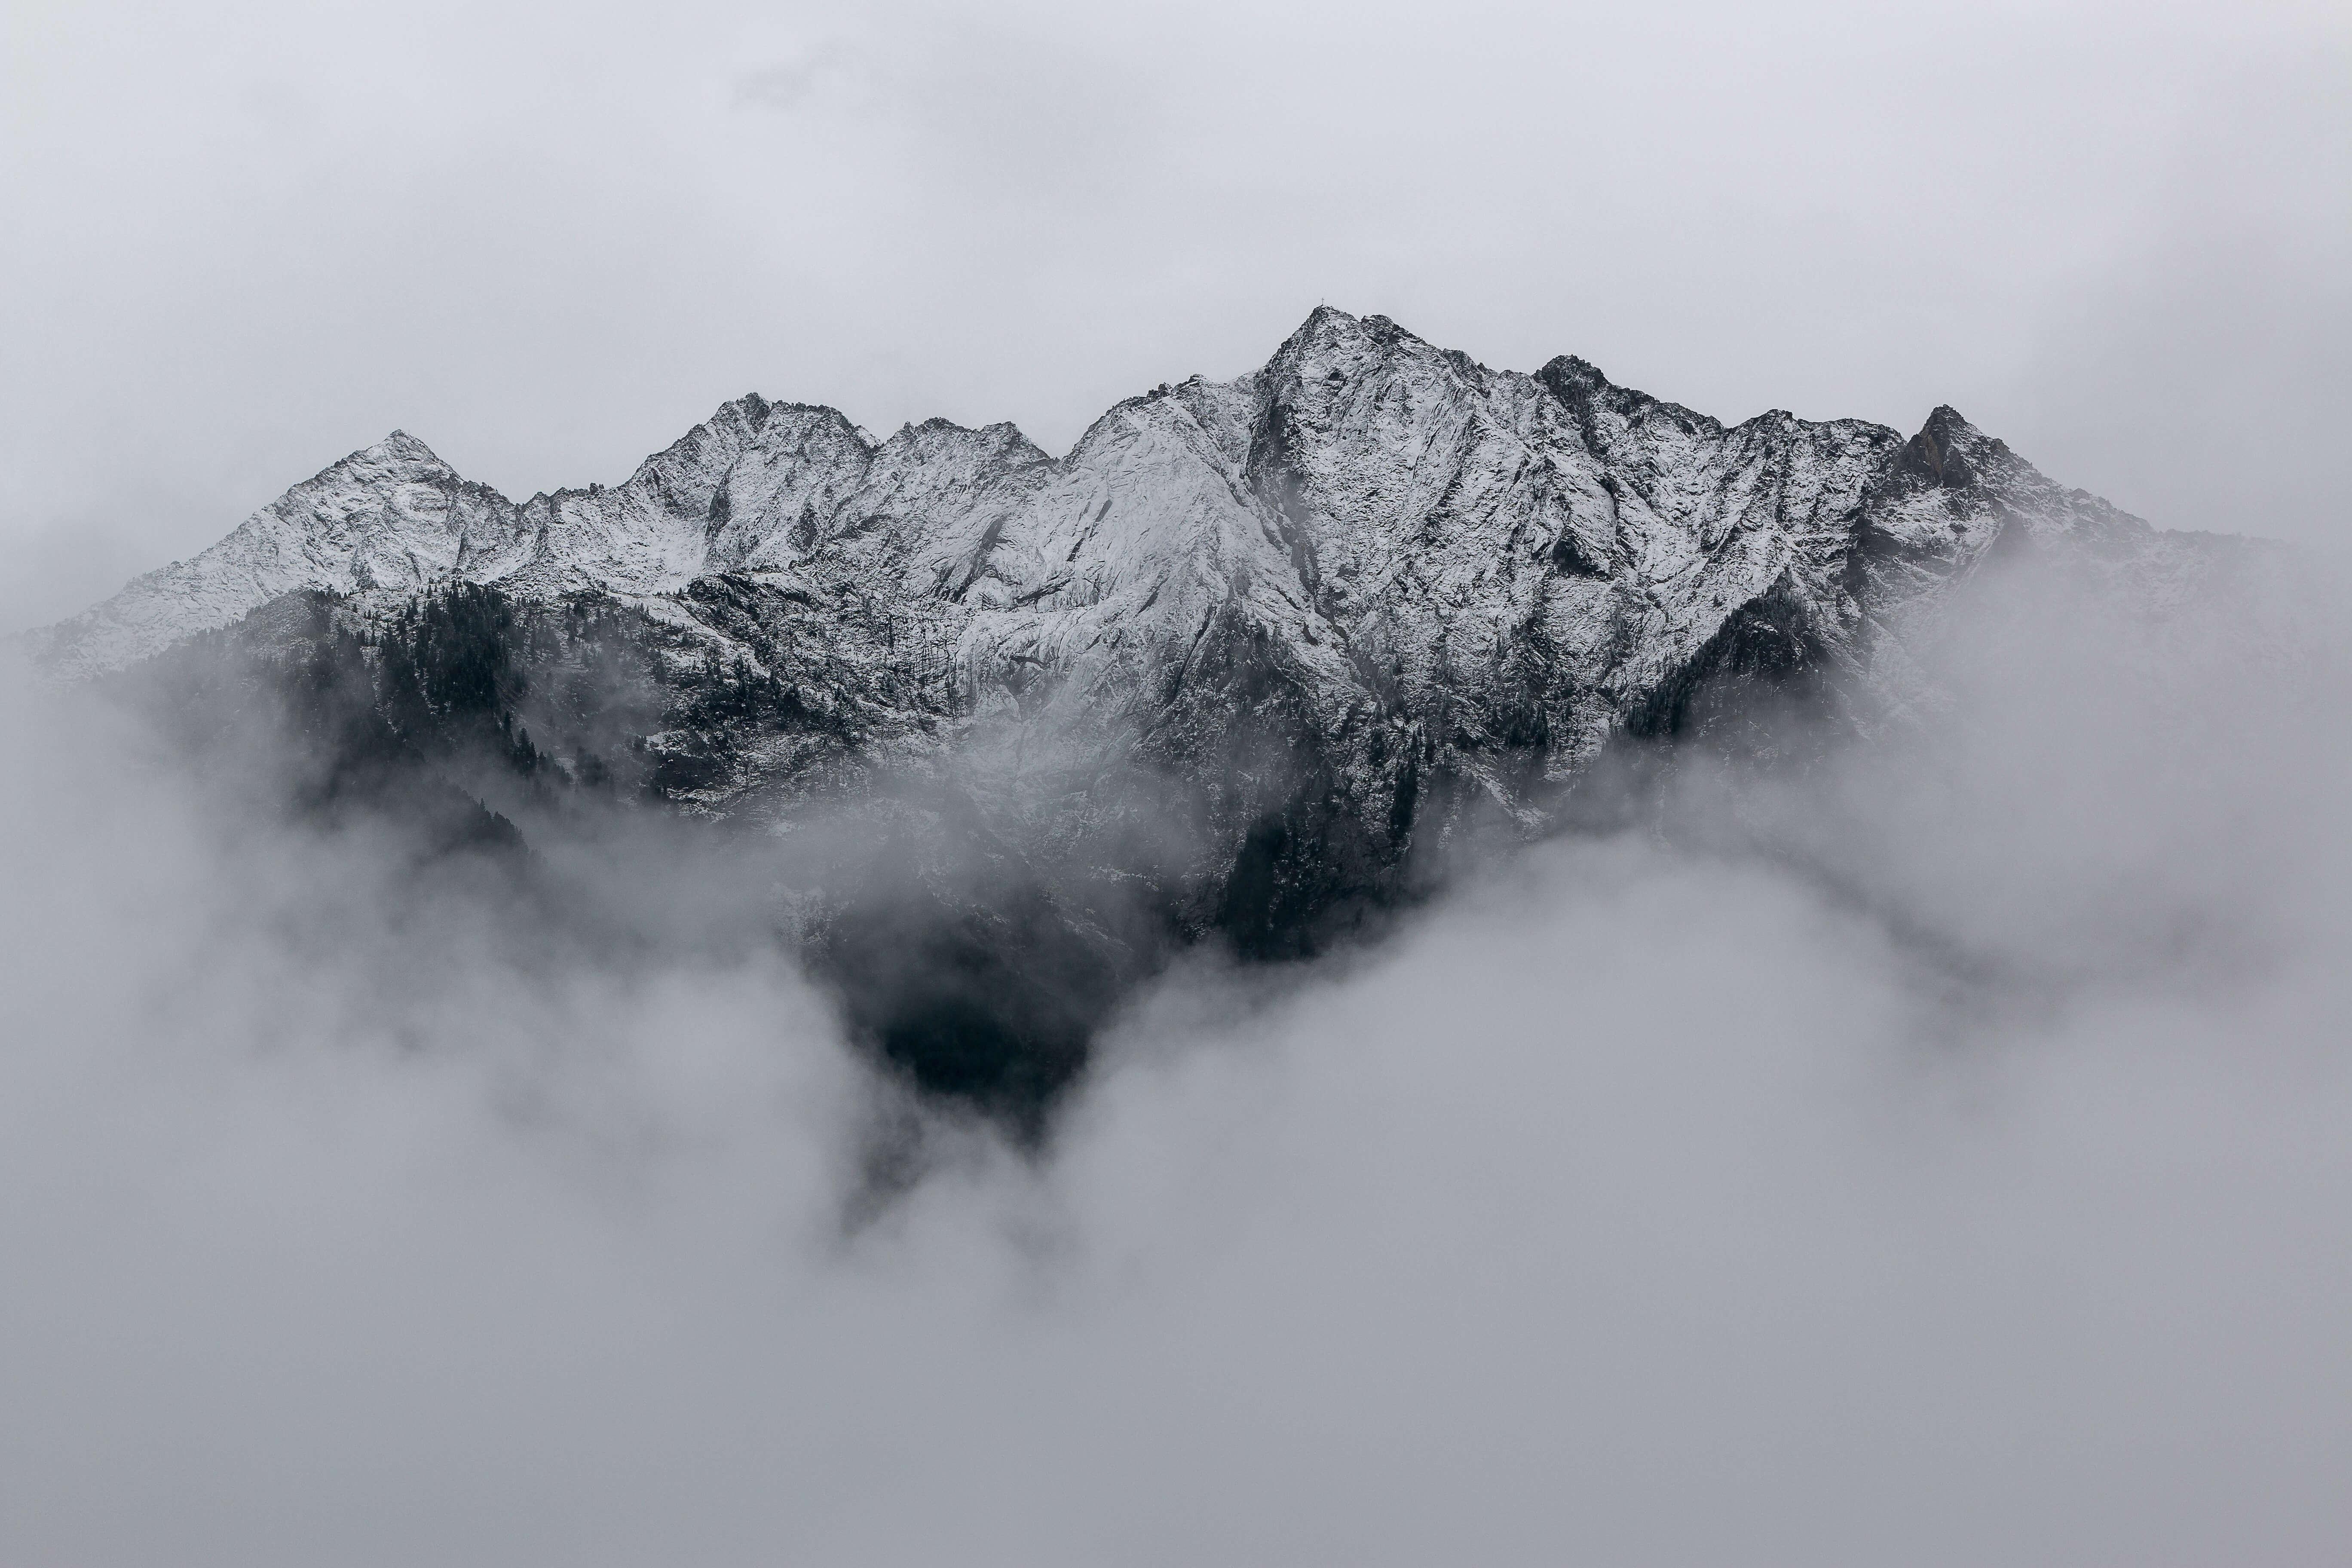 eberhard-grossgasteiger-382463-unsplash%202